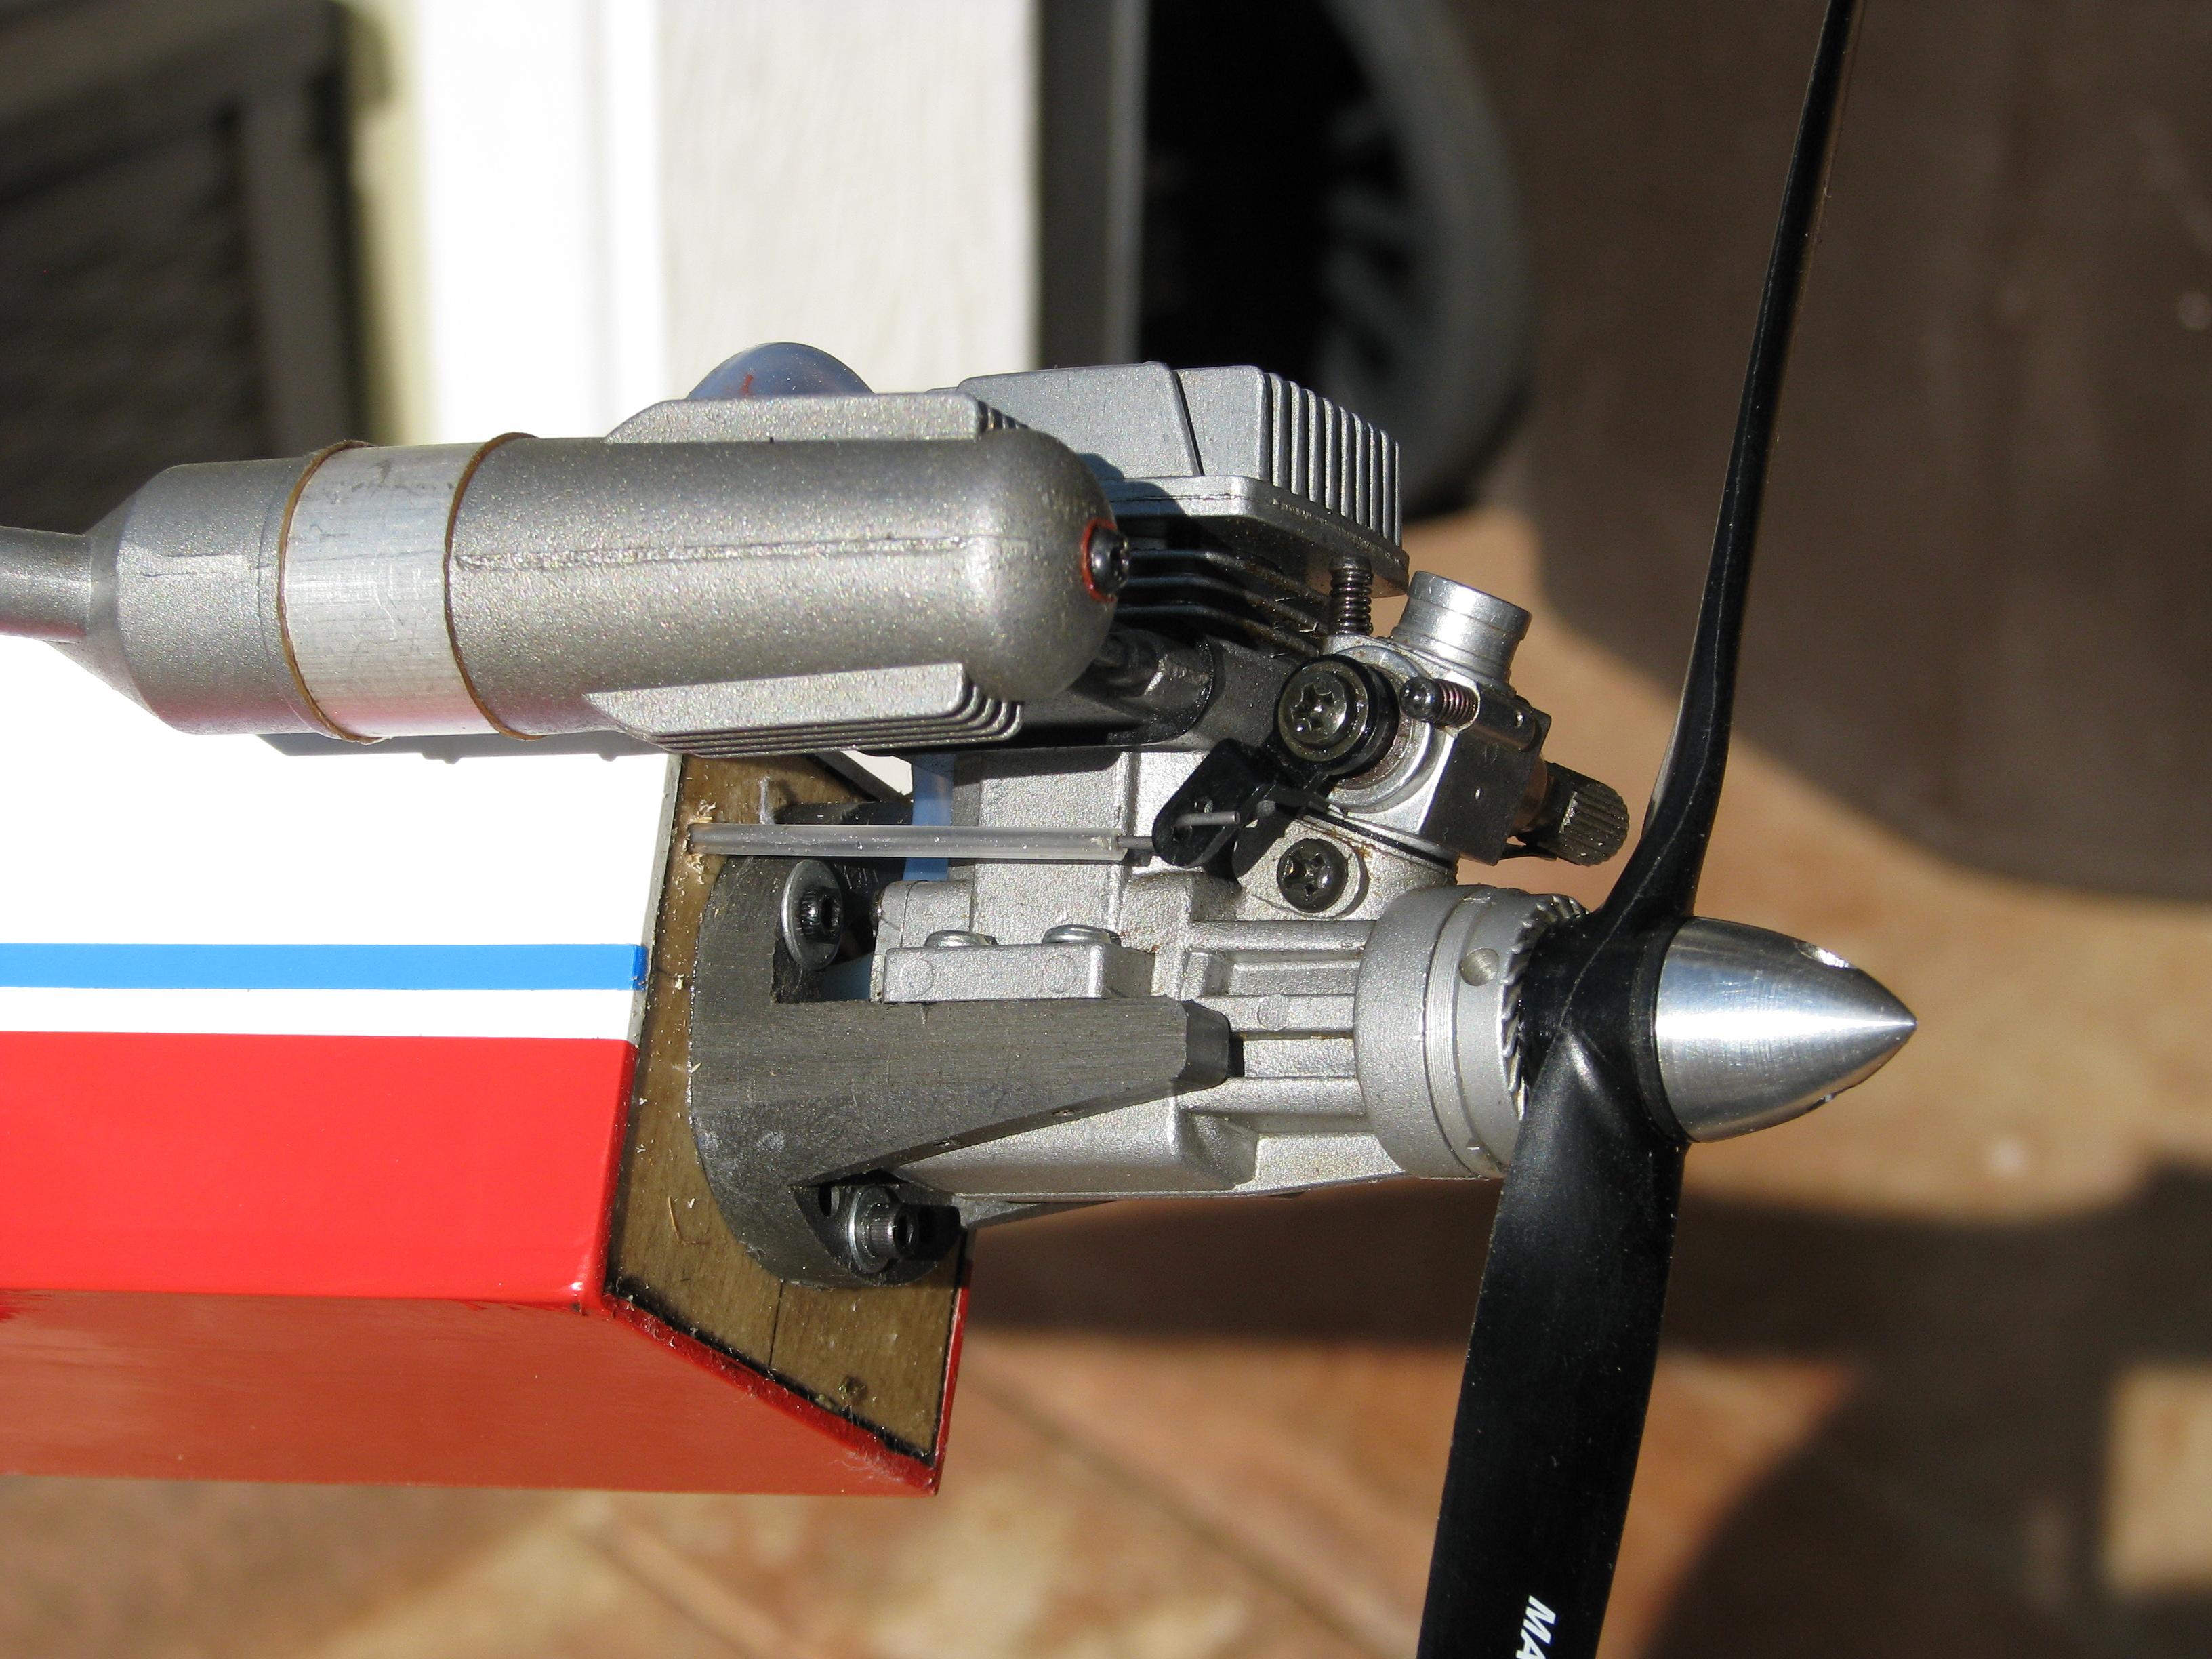 Click image for larger version  Name:Mini Ulta Stick 017.JPG Views:42 Size:1.76 MB ID:2123655